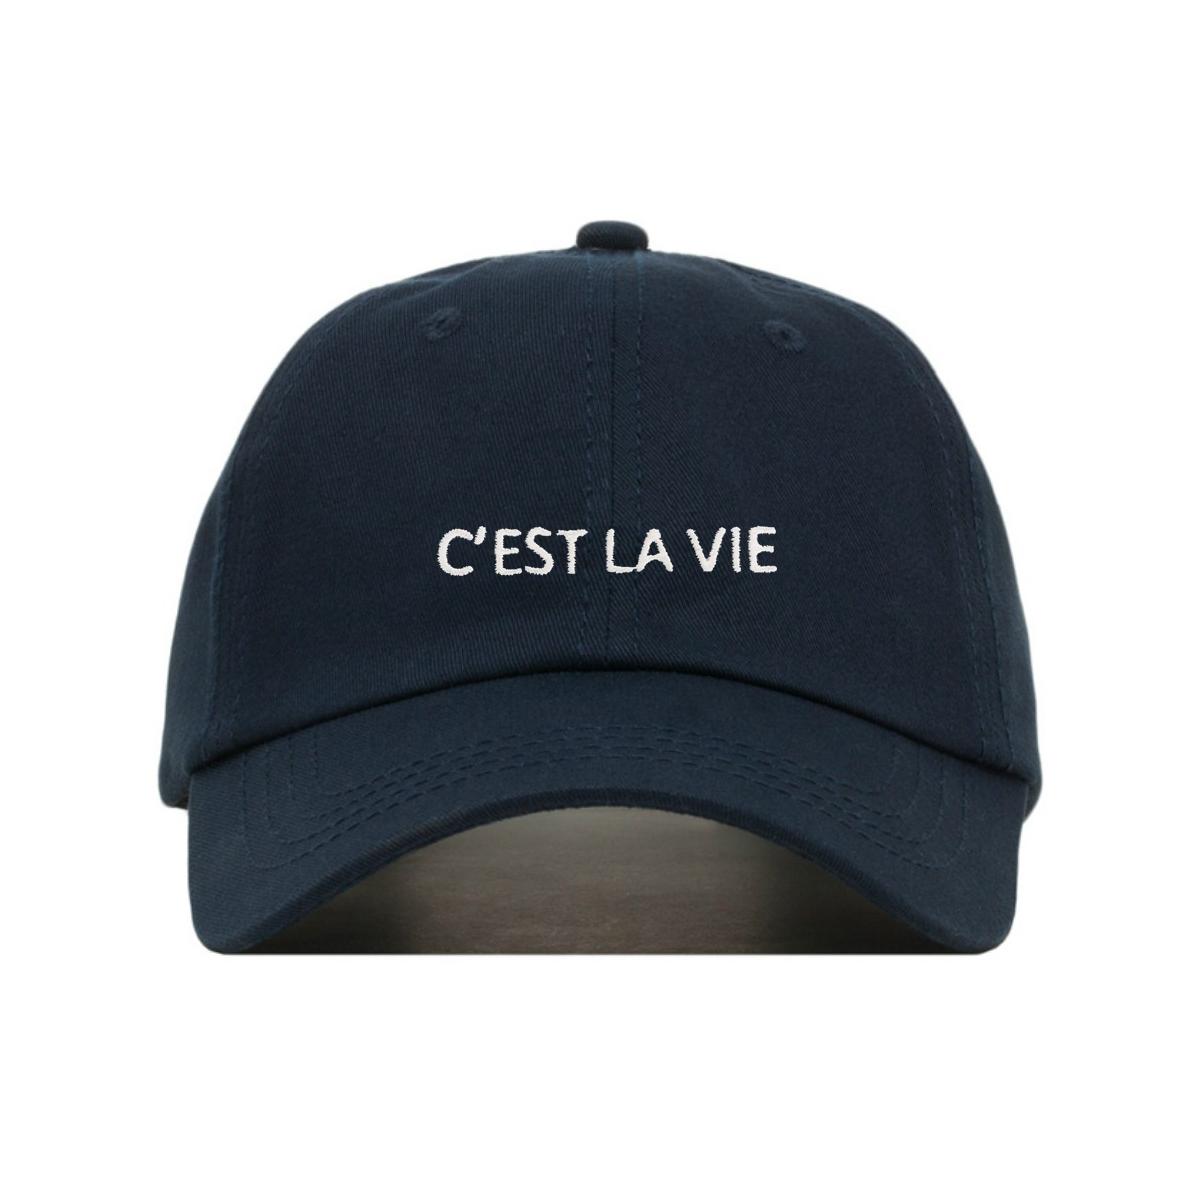 Unstructured Soft Cotton Multiple Colors Embroidered Dad Cap Adjustable Strap Back Cest La Vie Baseball Hat